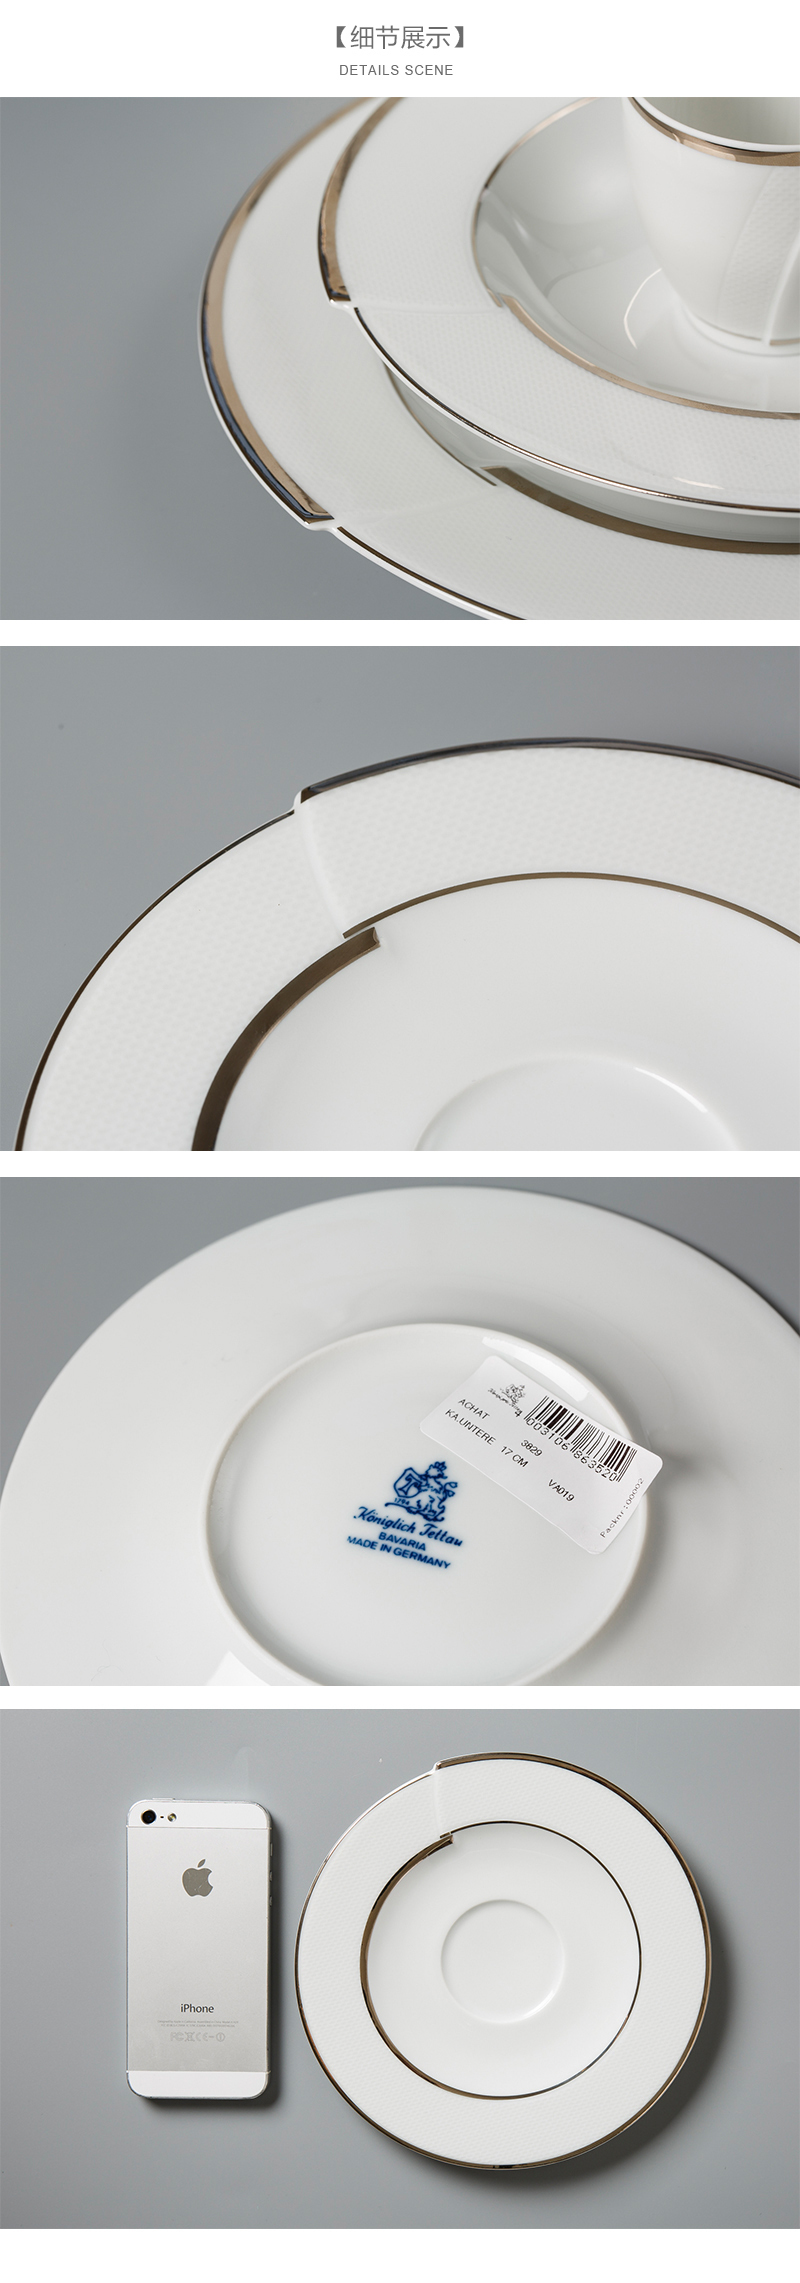 Seltmann Weiden咖啡杯碟细节展示